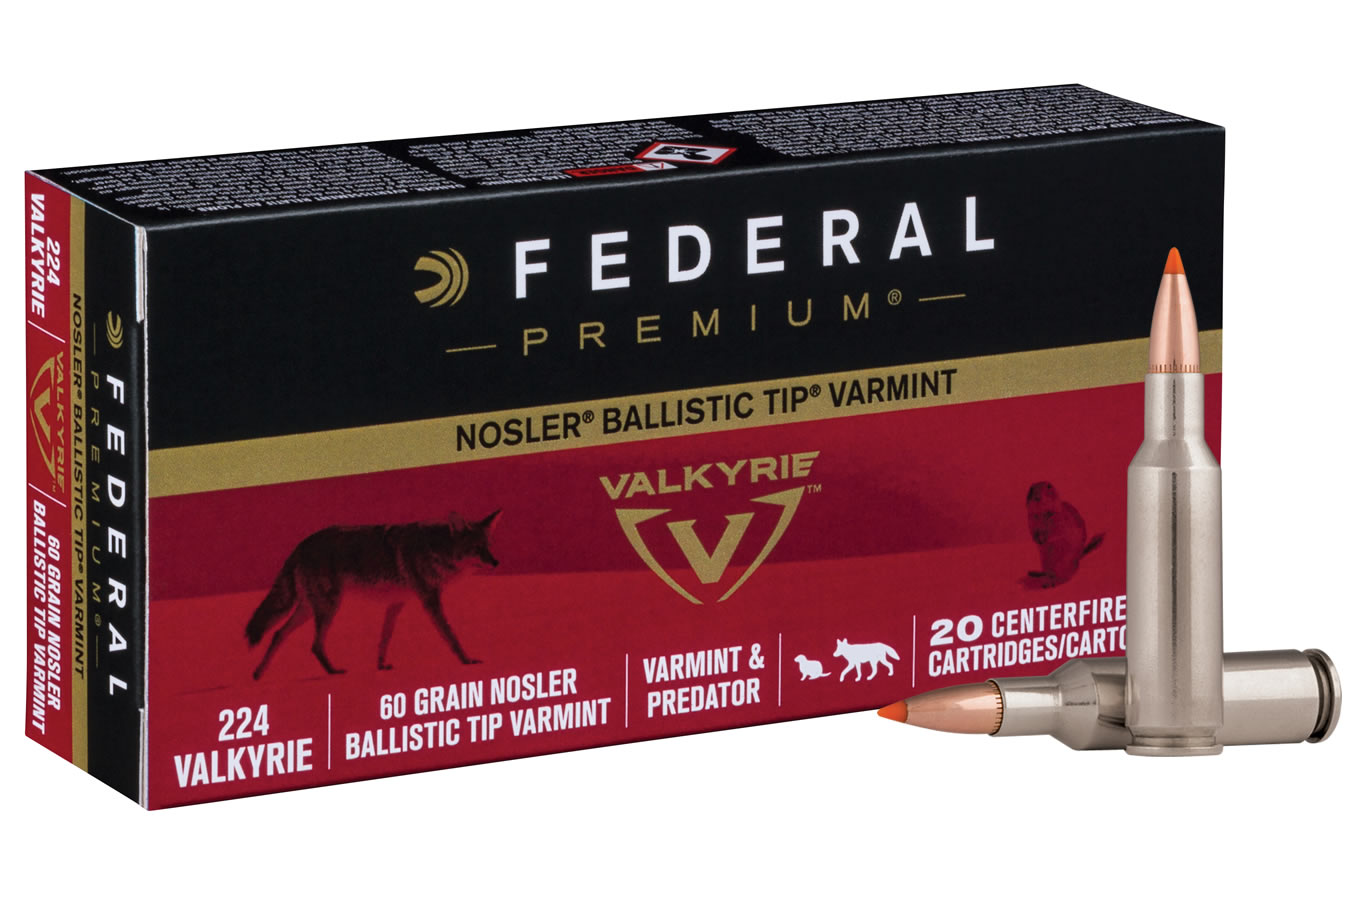 224 Valkyrie 60 gr Nosler Ballistic Tip Varmint 20/Box